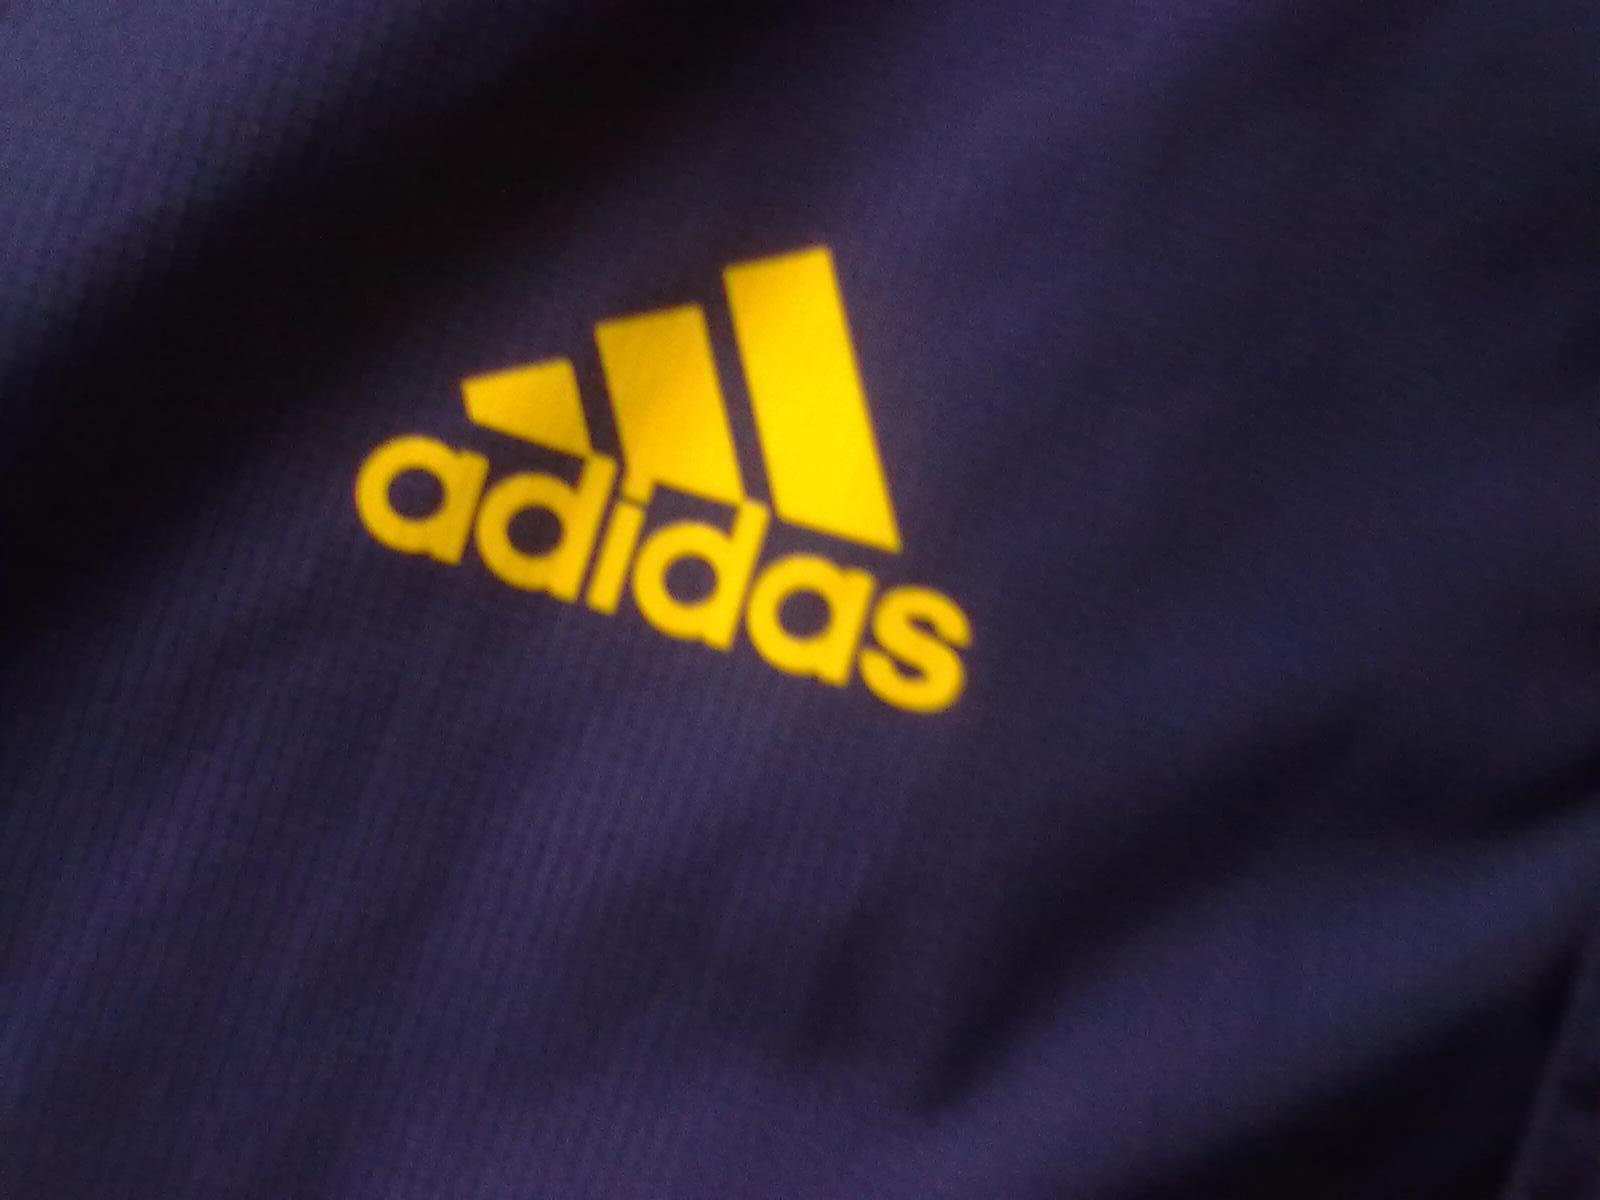 chaqueta del manchester united en colombia